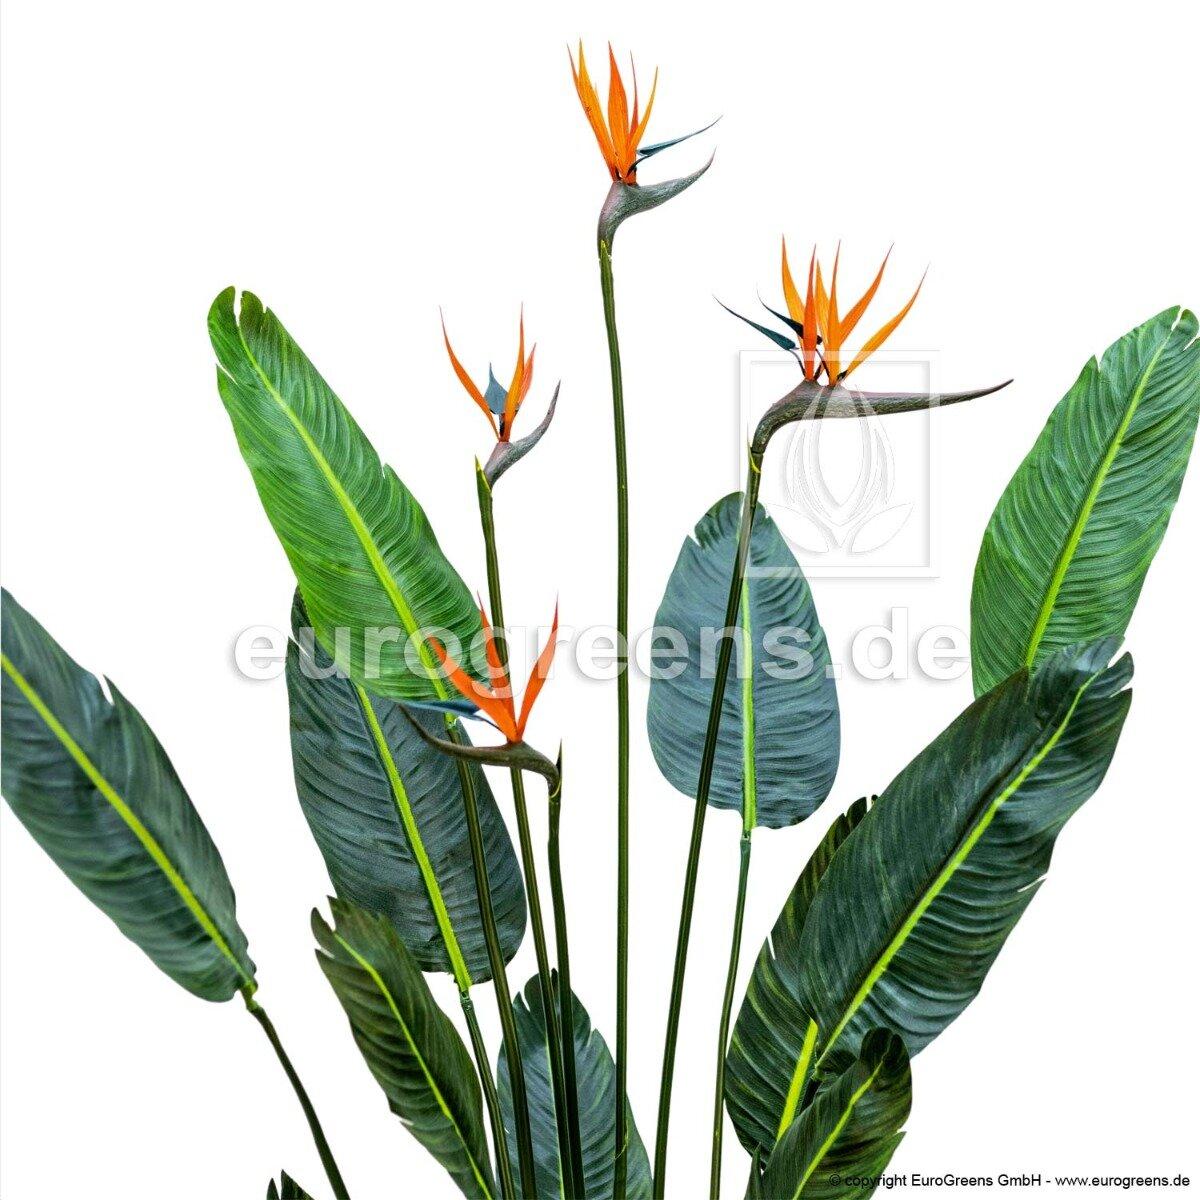 Umělá rostlina Strelície 150 cm